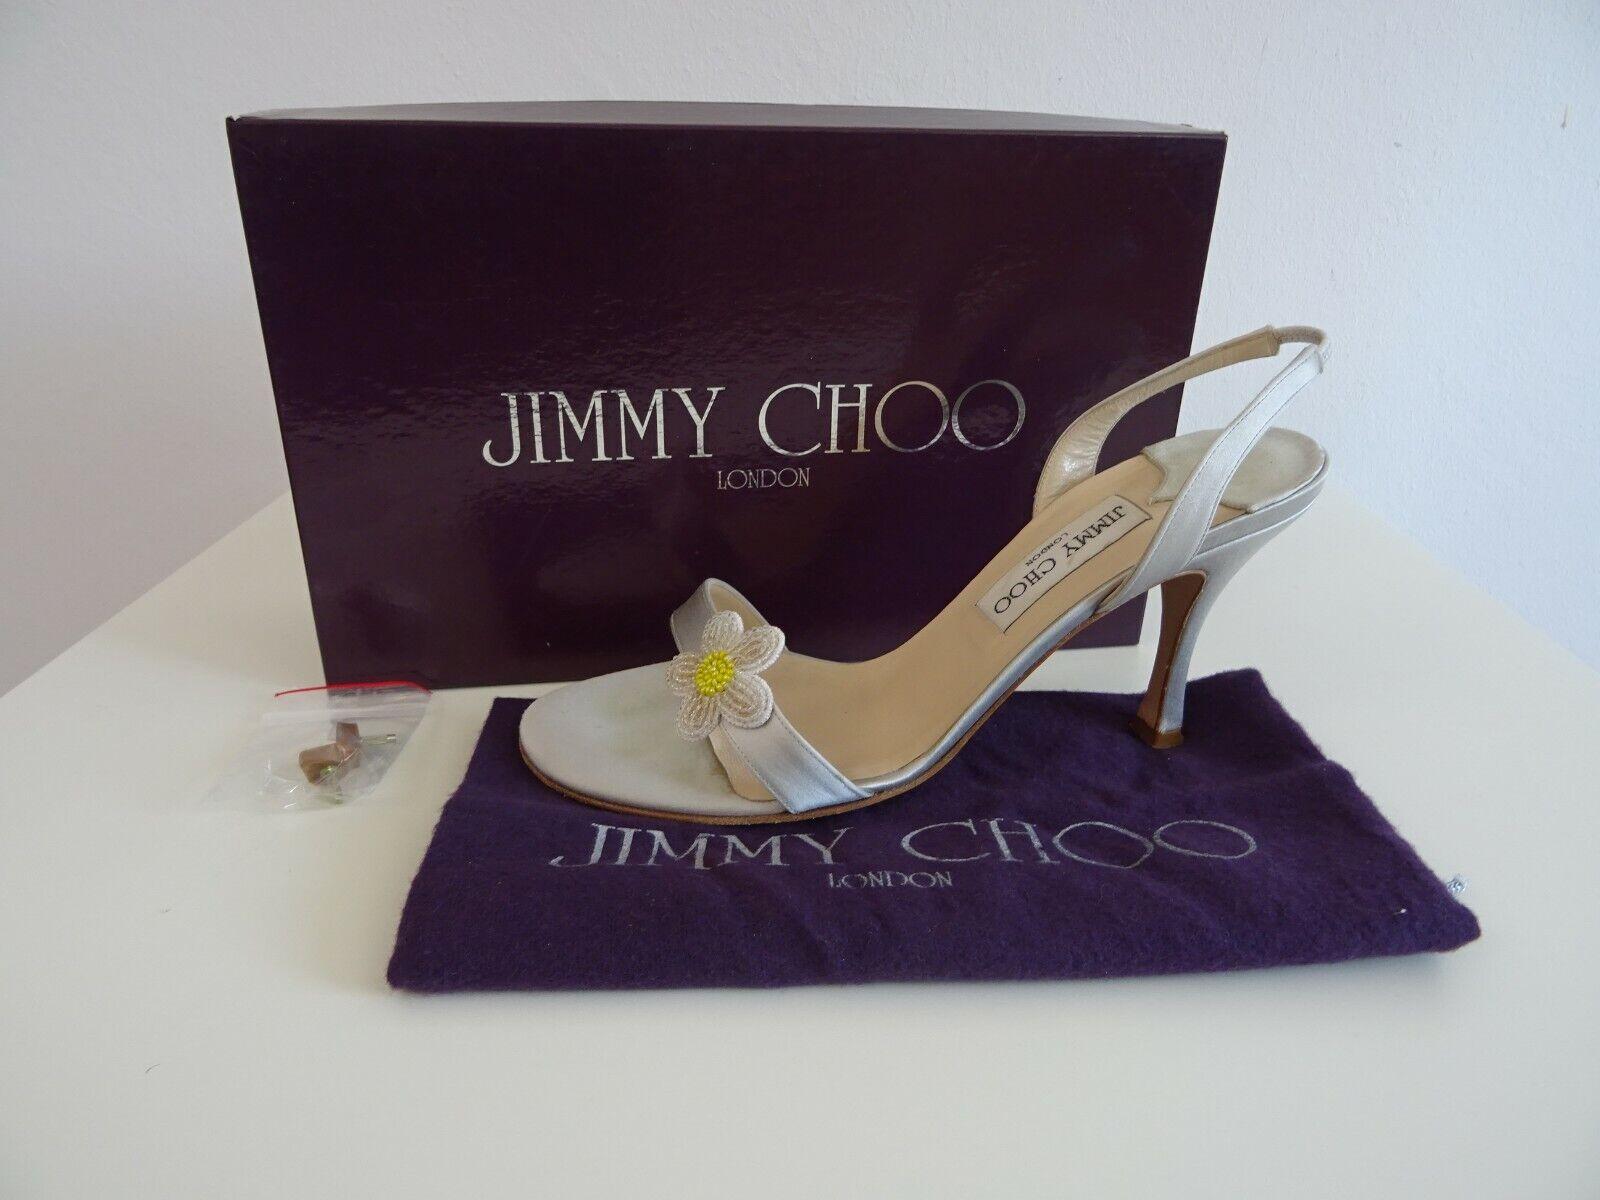 Jimmy CHOO kvinnor skor Sandals Sandal High klackar silver Satin on läder 38